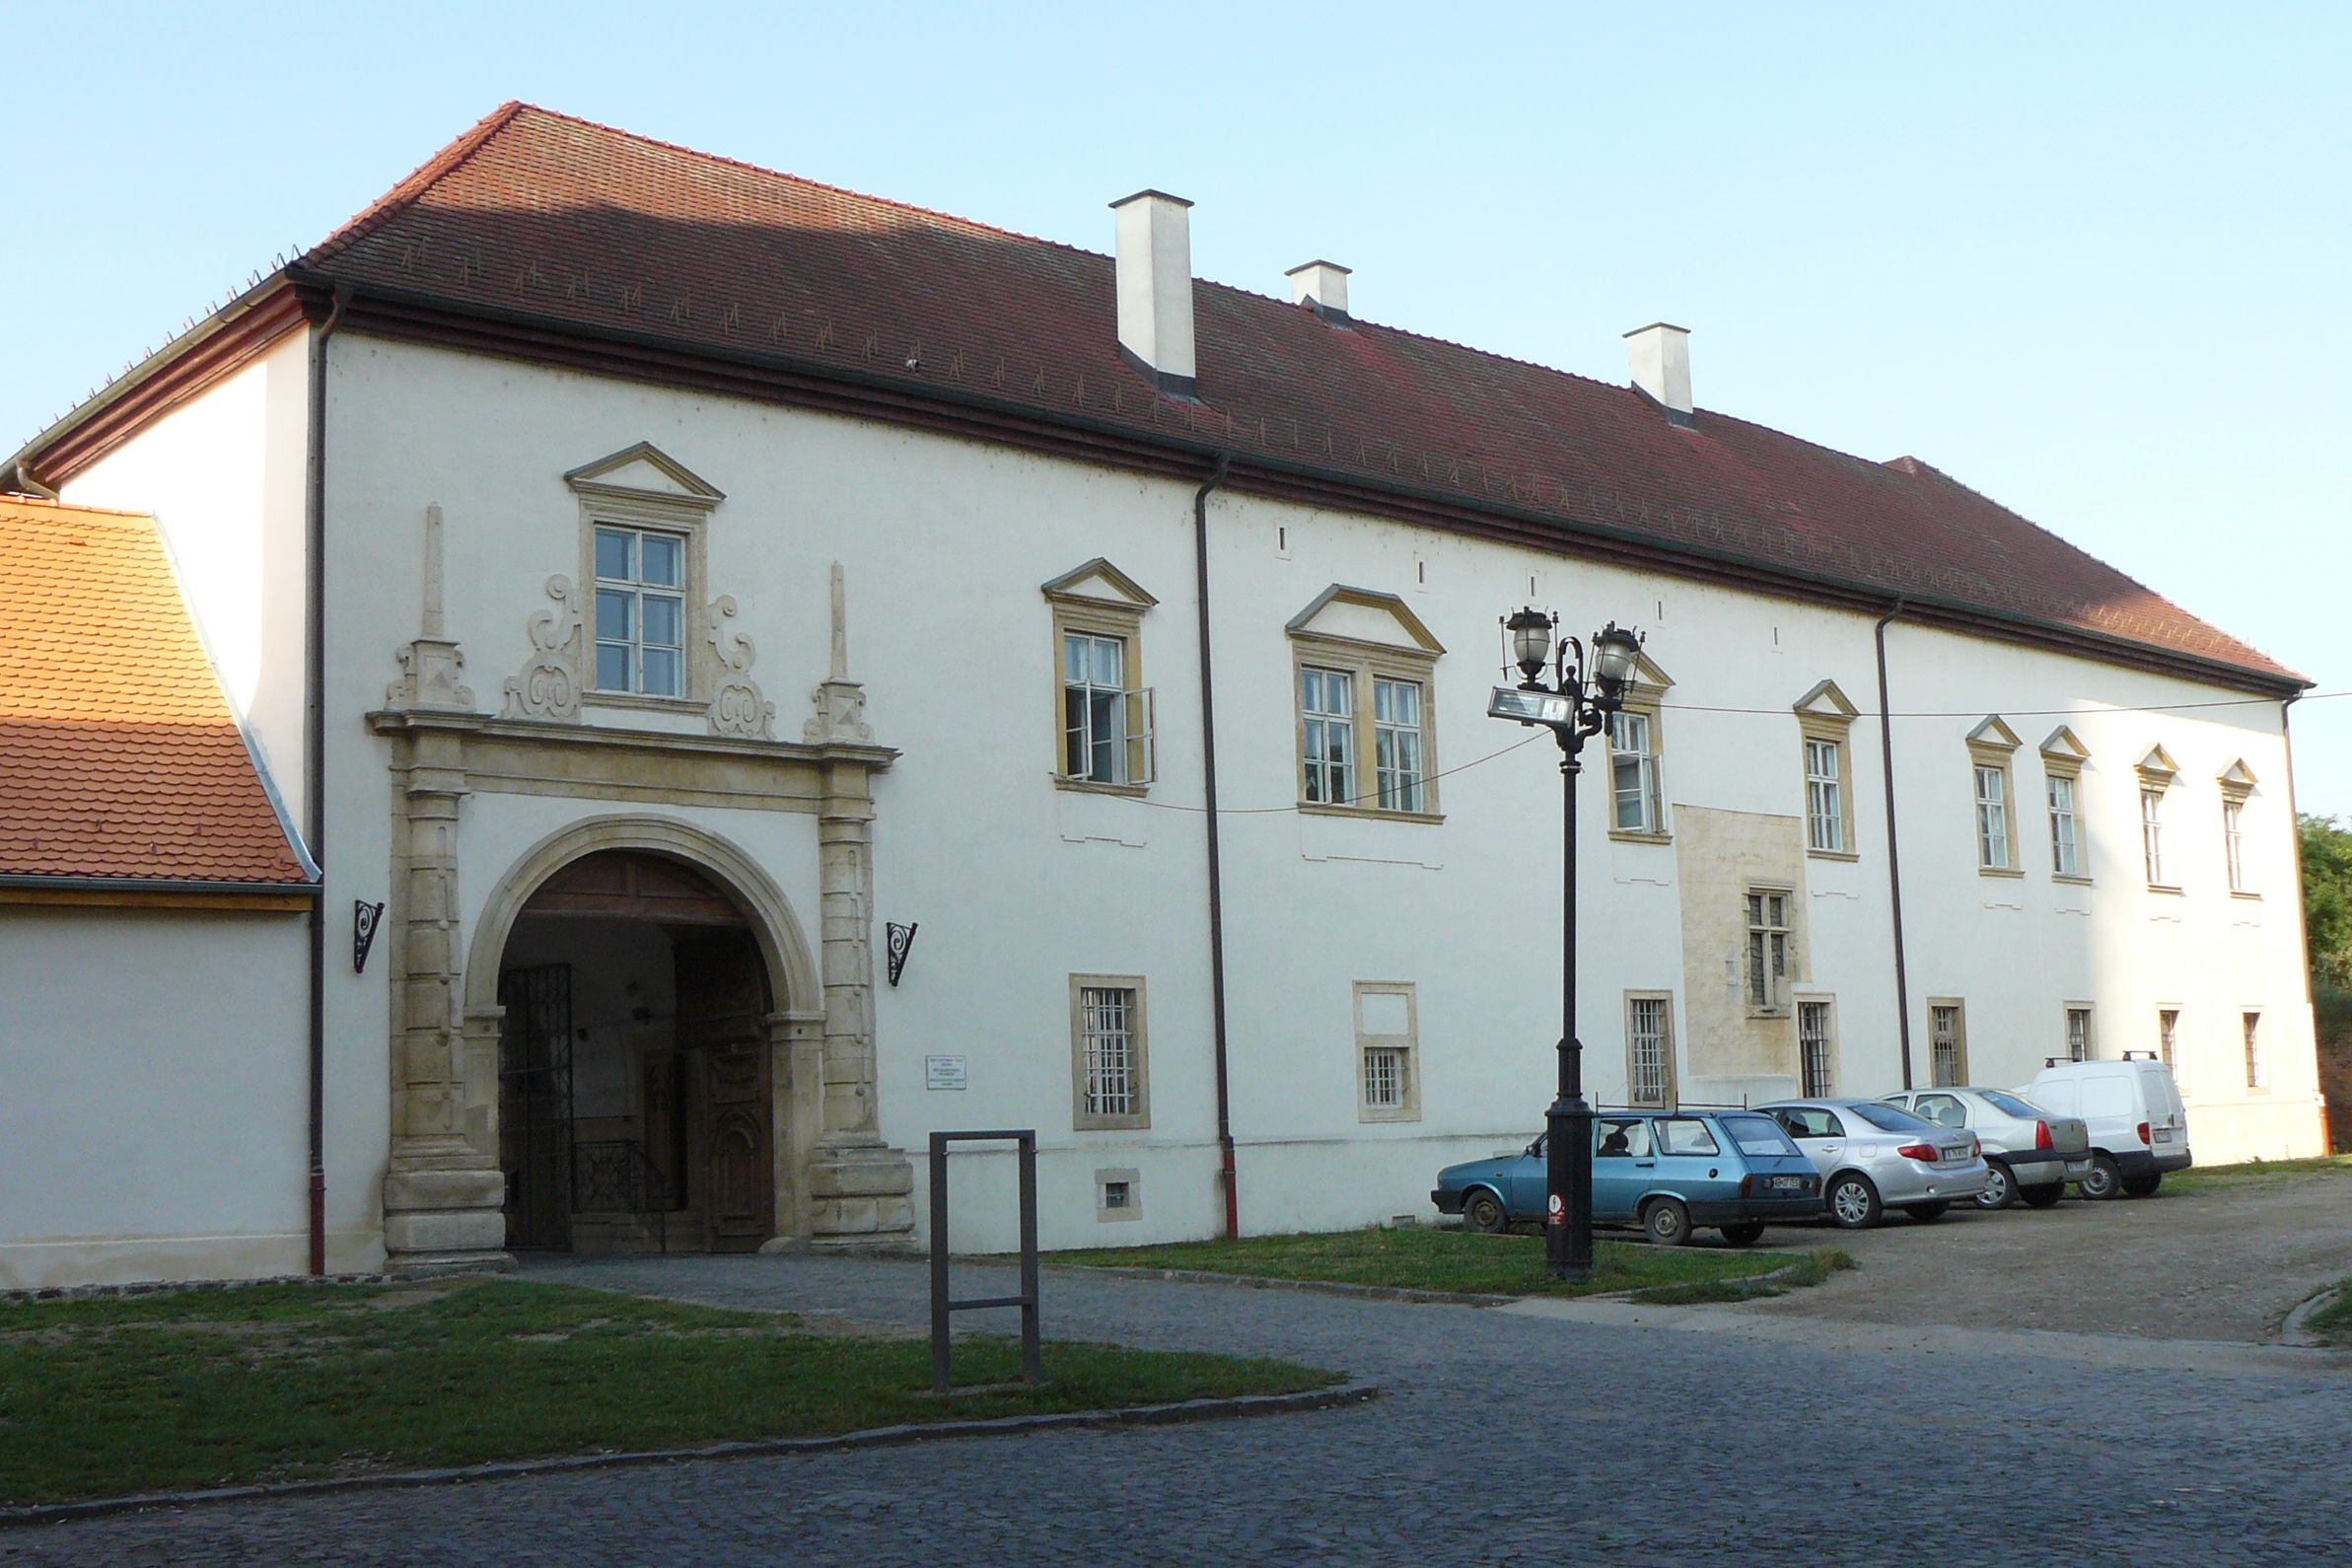 The episcopal palace of the Roman Catholic Archbishopric of Alba Iulia